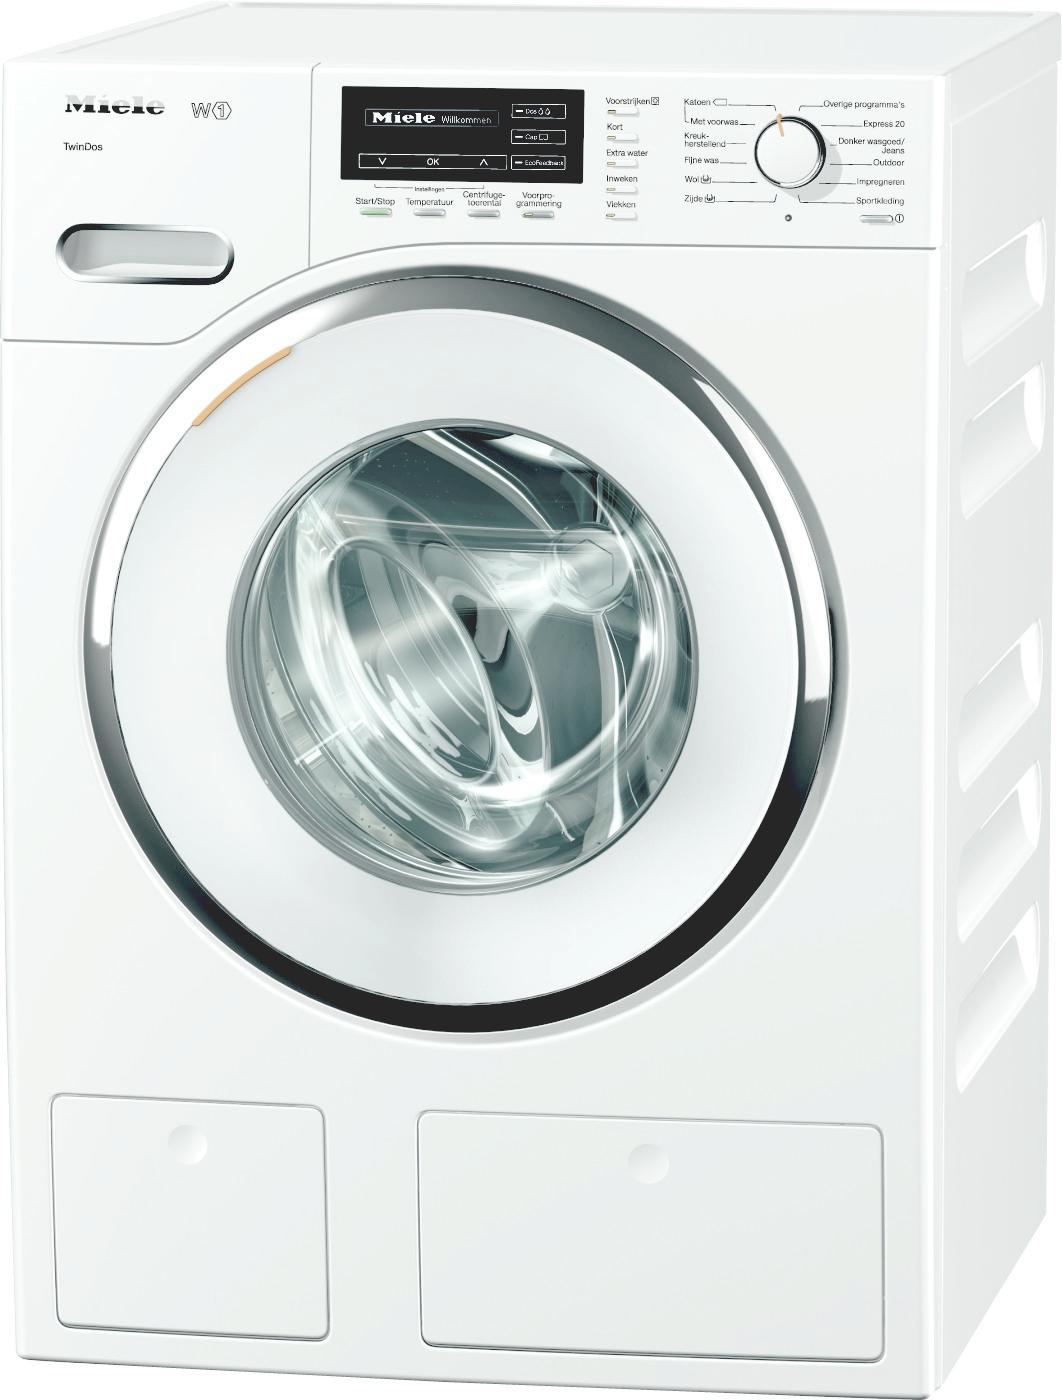 miele wmg120 wcs wasmachine 8 kg en 1600 toeren. Black Bedroom Furniture Sets. Home Design Ideas